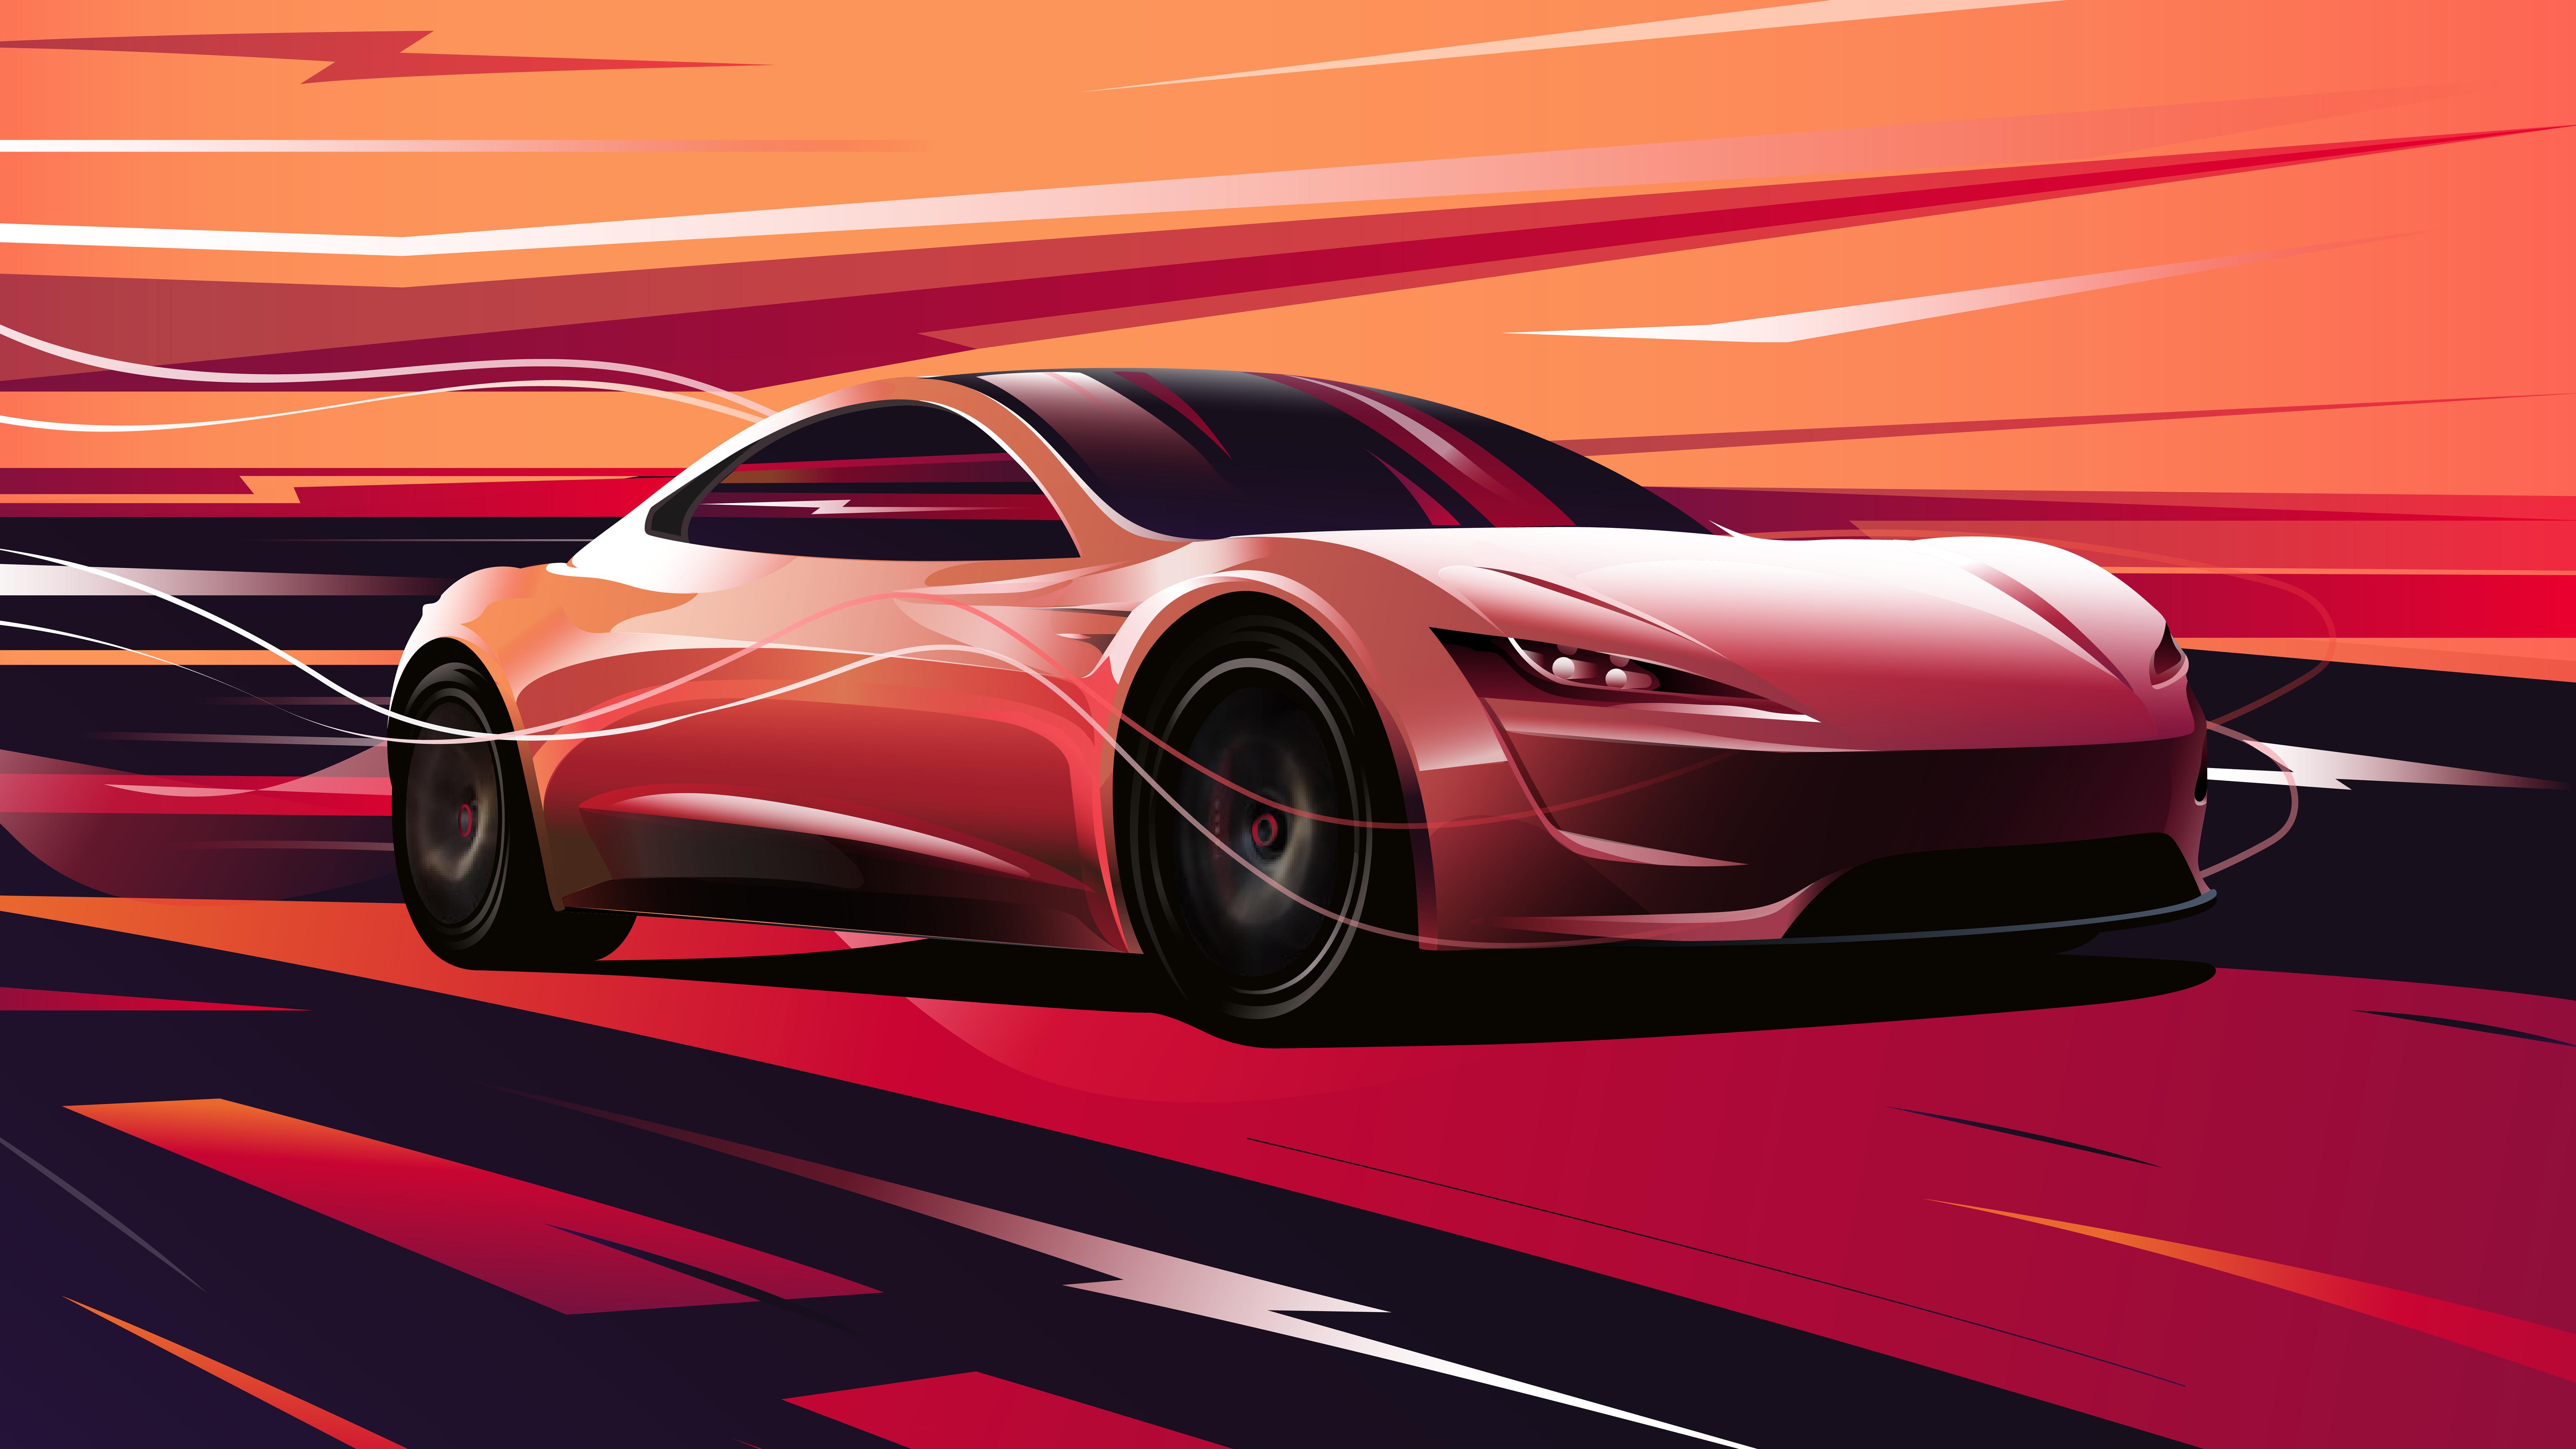 Tesla Roadster 2020 4k 8k Wallpapers   Tesla Roadster 2020 Phone 7680x4320